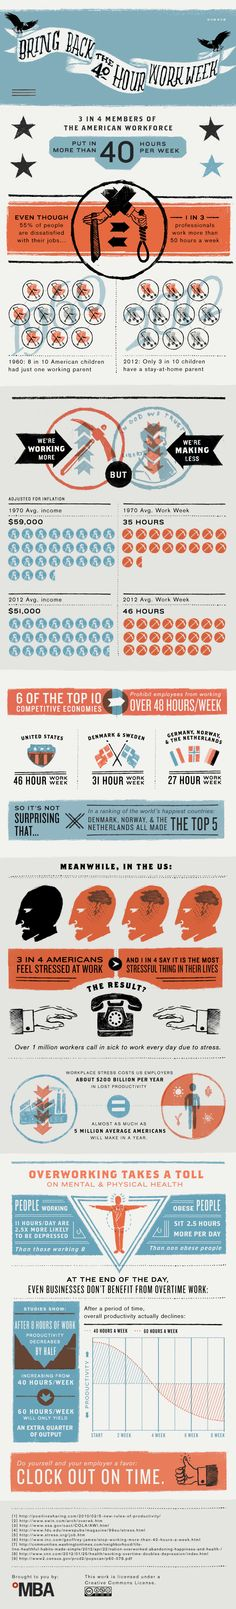 Work Week Infographic: Bring Back The 40 Hour Work Week - ComplianceandSafety.com